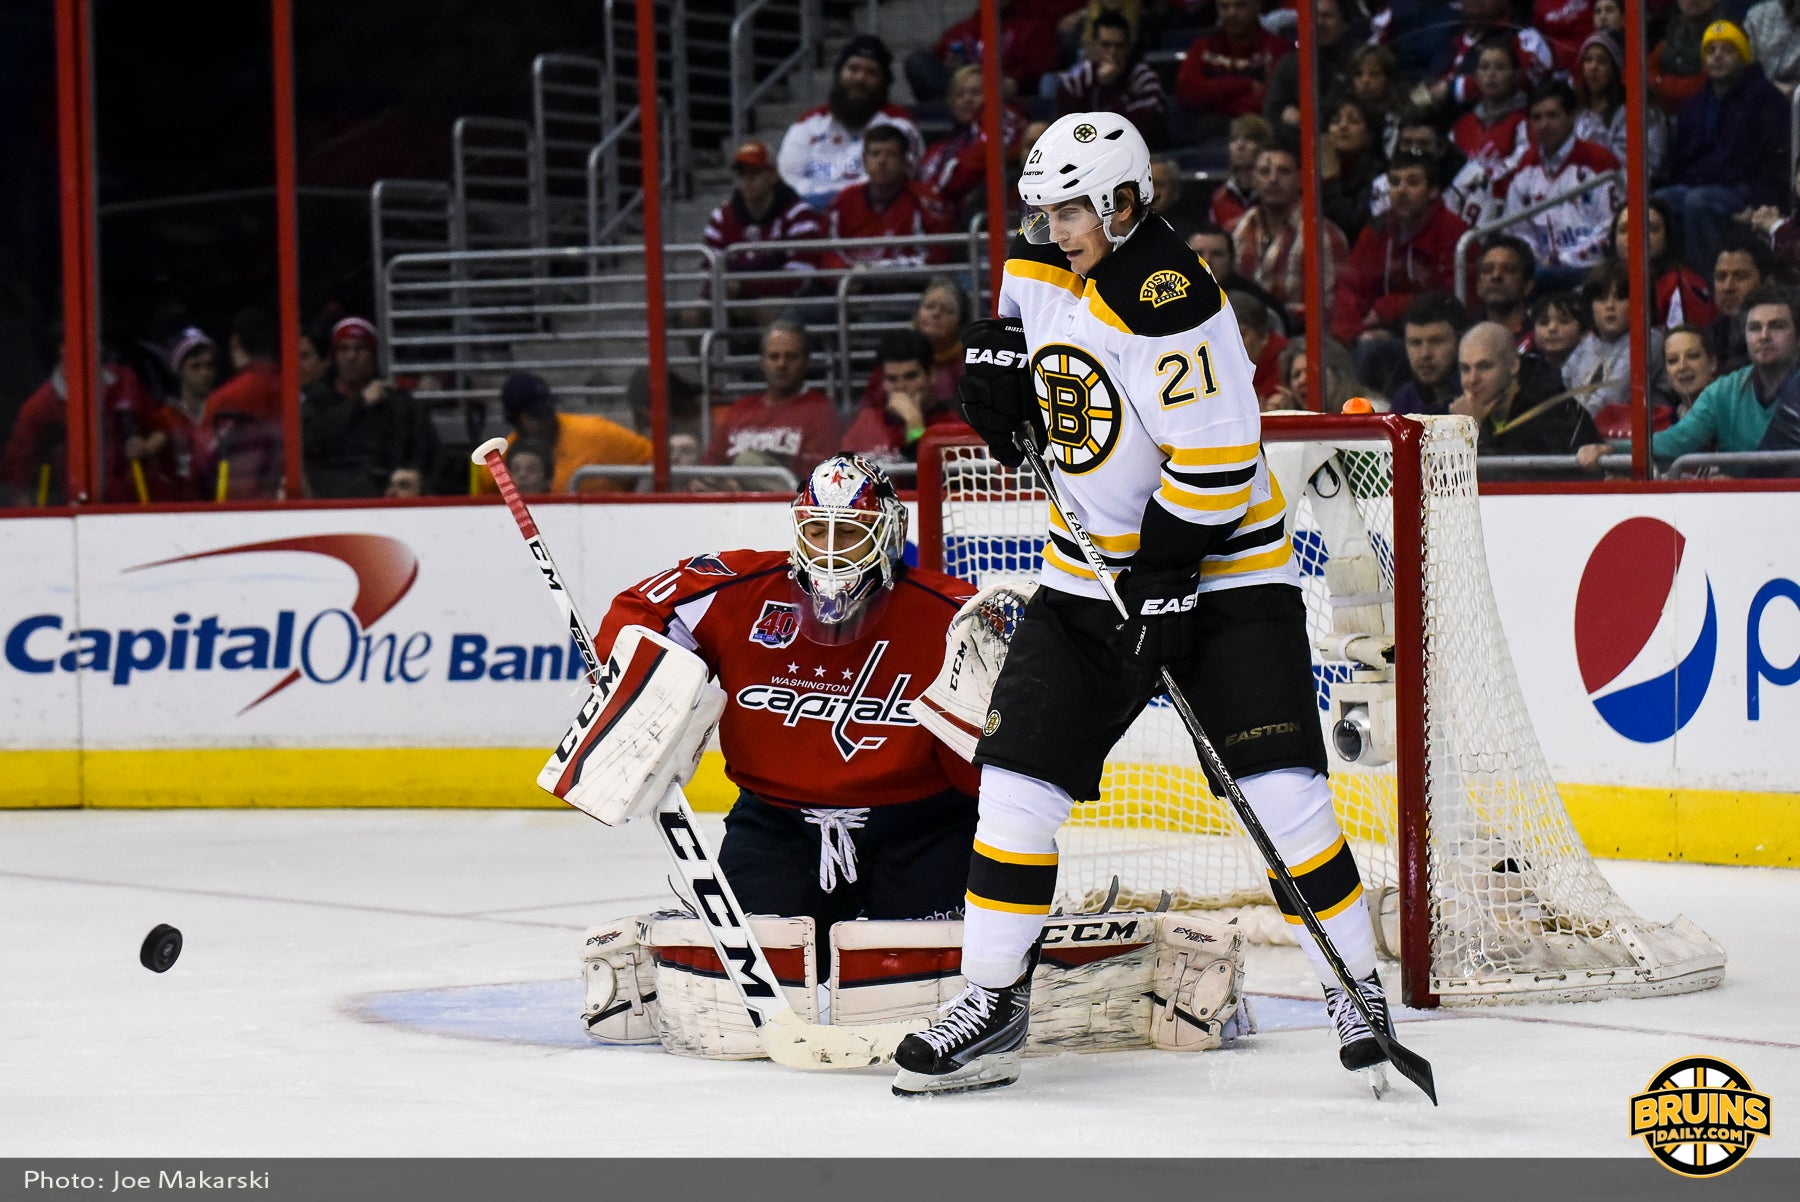 Bruins playoff hopes BDC.jpg